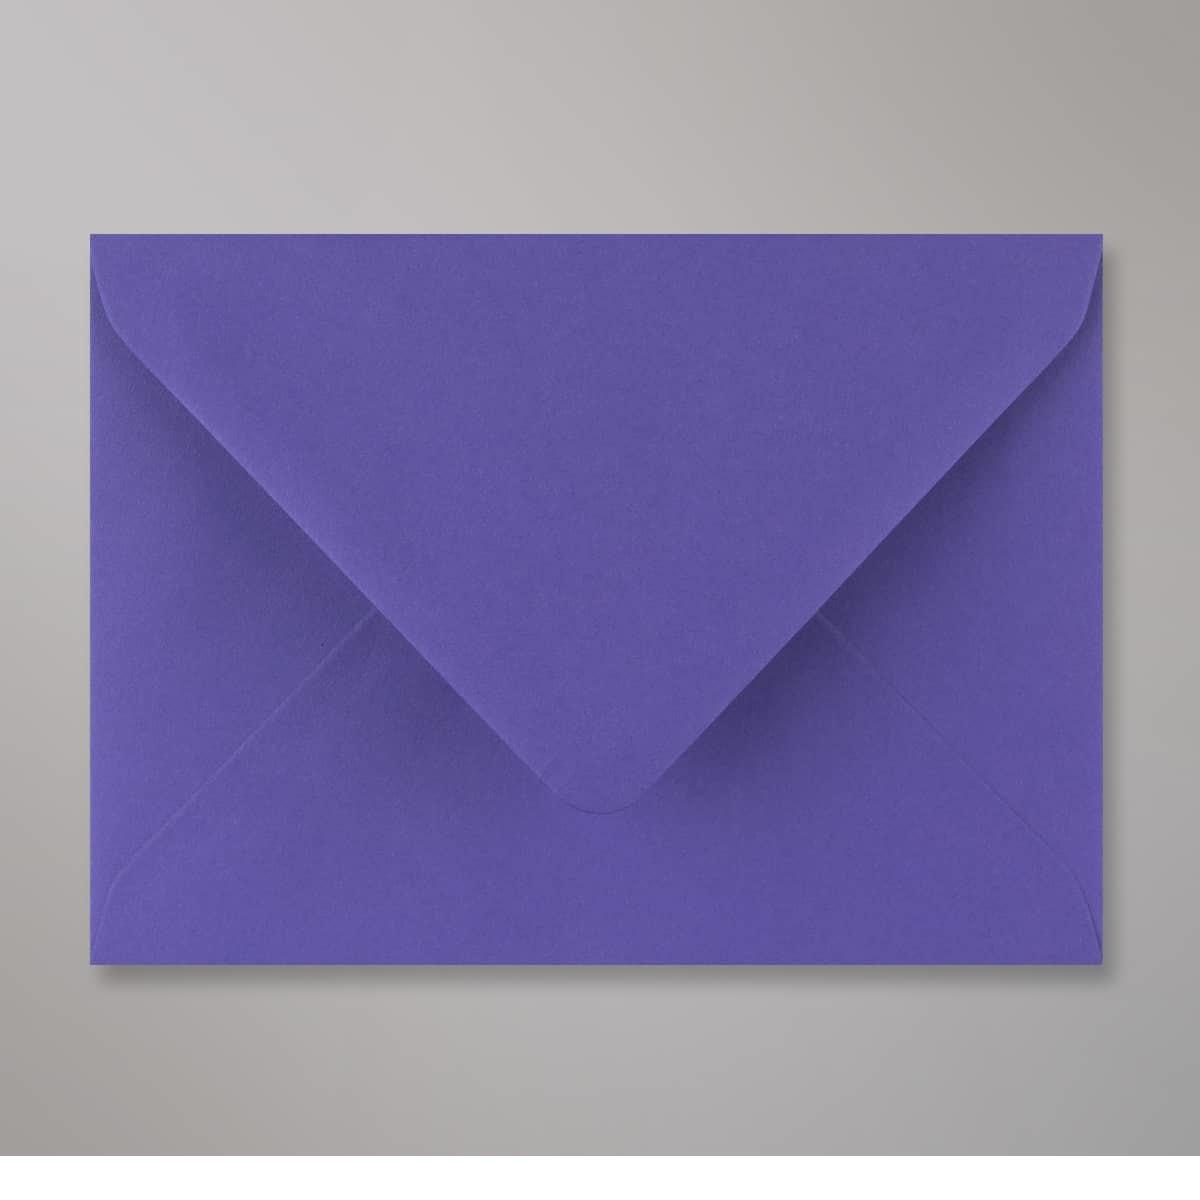 Enveloppe bleue iris 114x162 mm (C6)